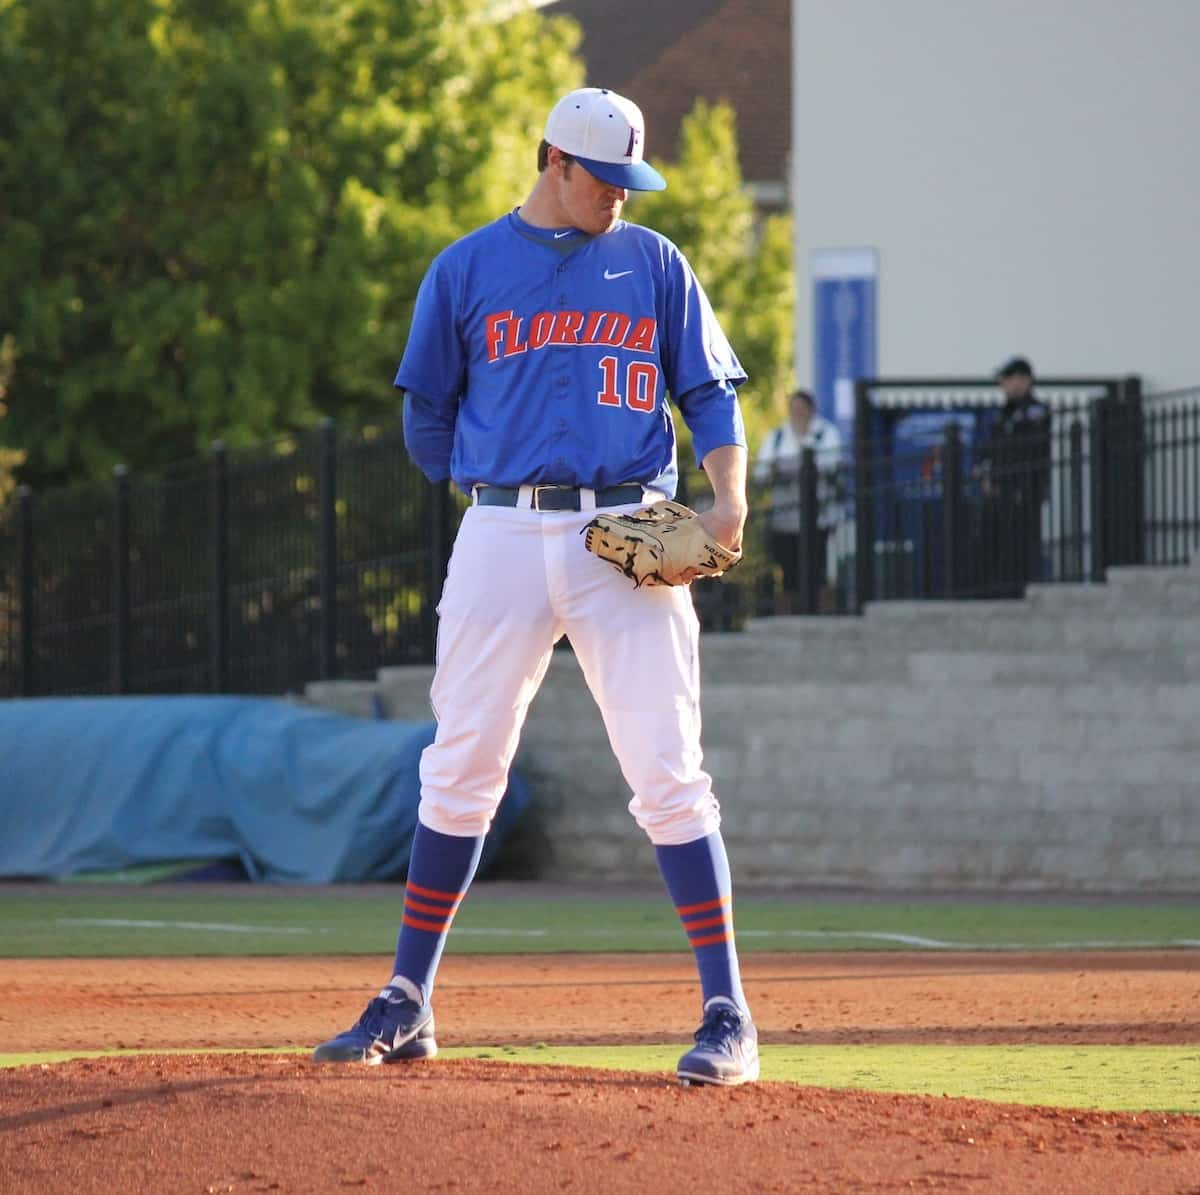 Simpson_Tucker_160213_Florida_Gators_Baseball